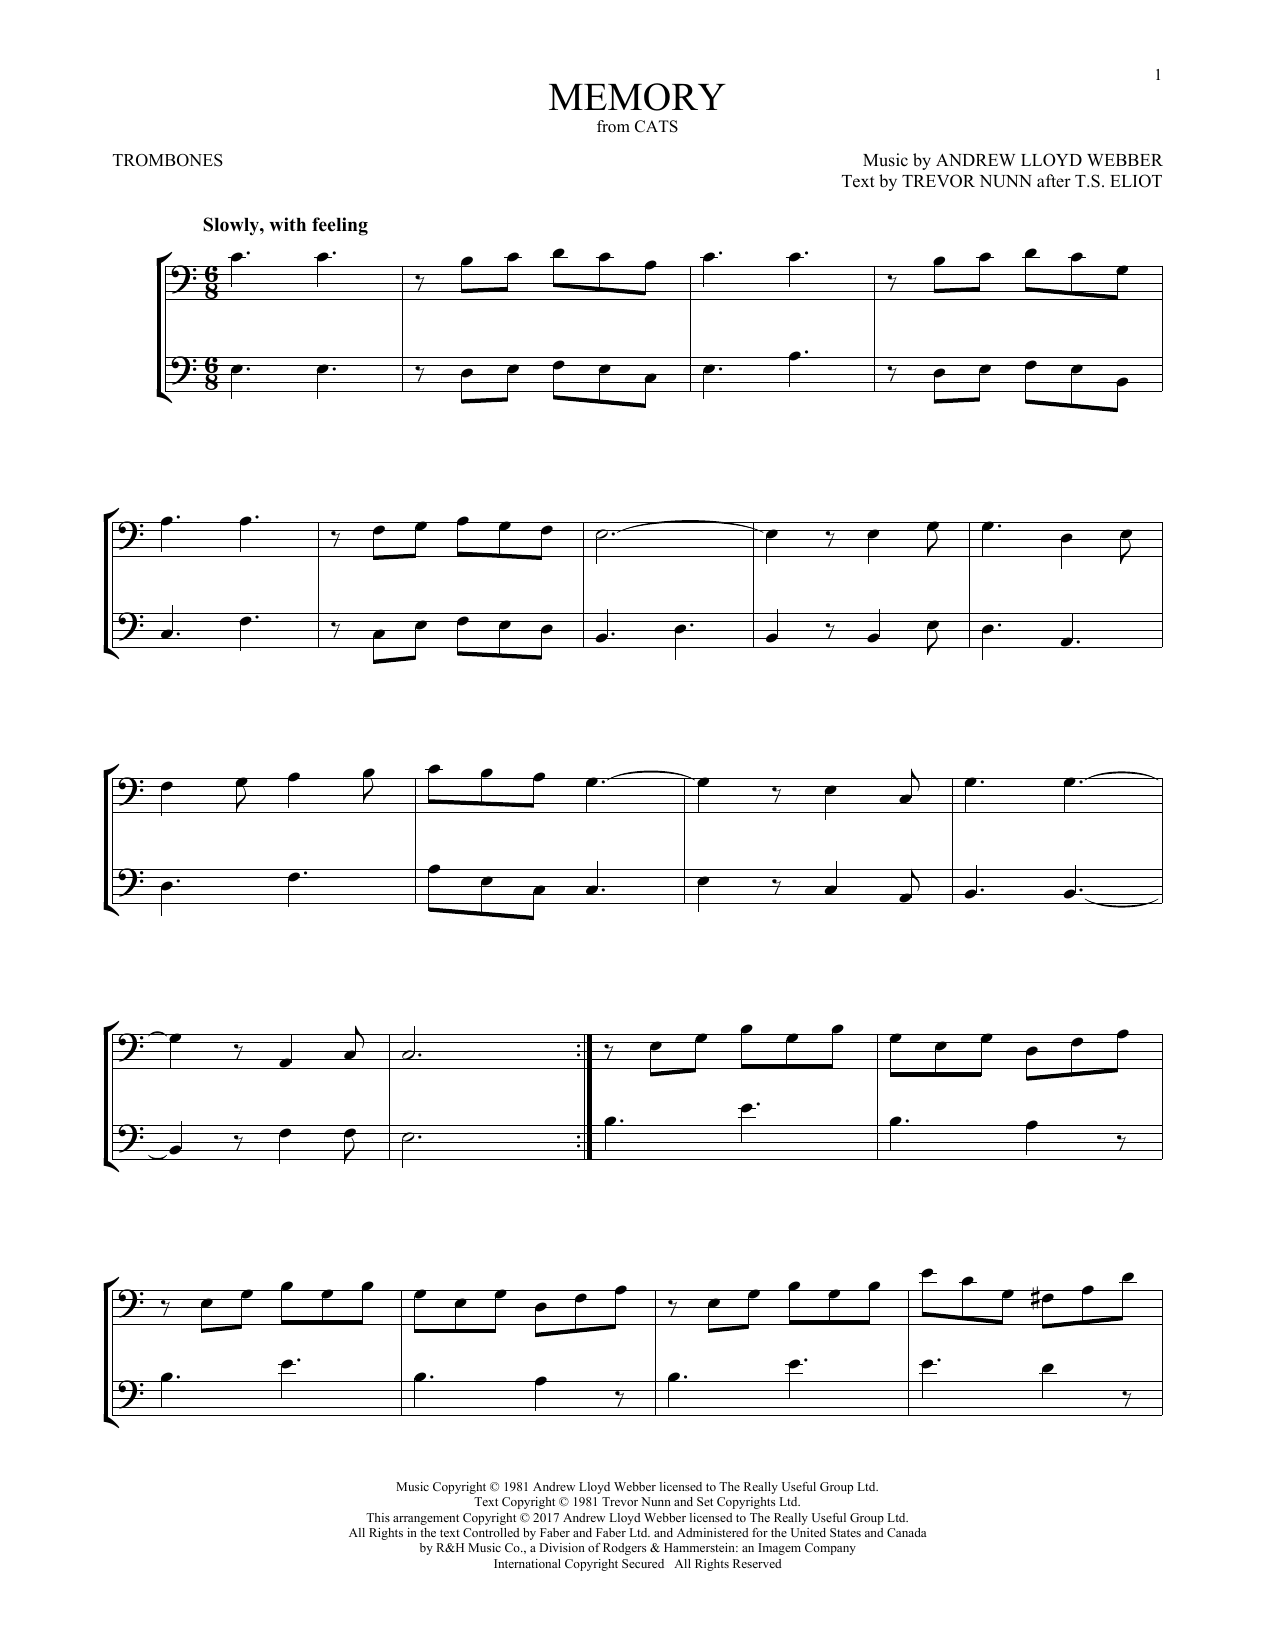 Memory (from Cats) (Trombone Duet)